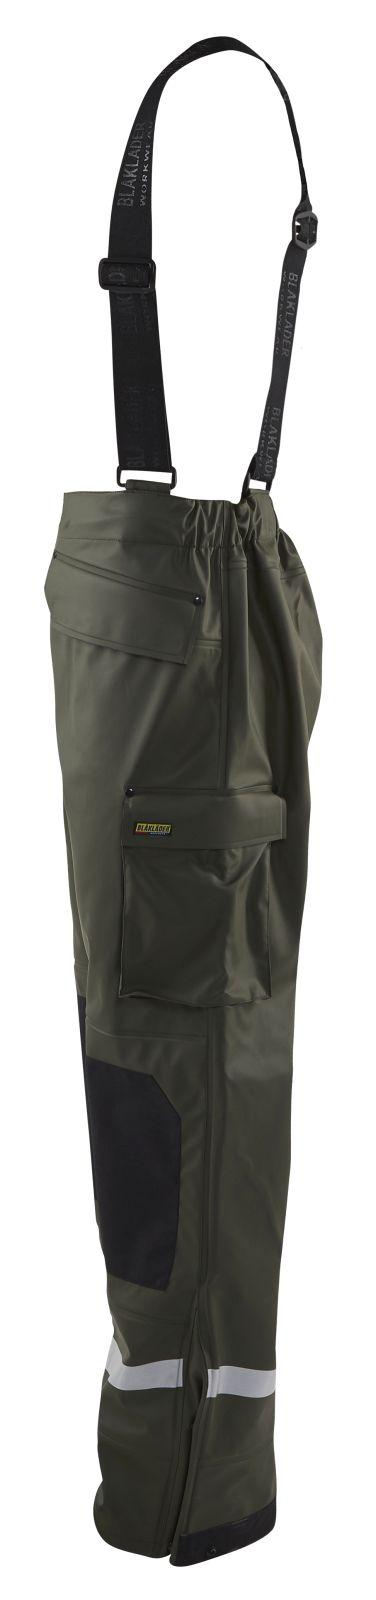 Blaklader Regenbroeken 13052003 army groen(4600)